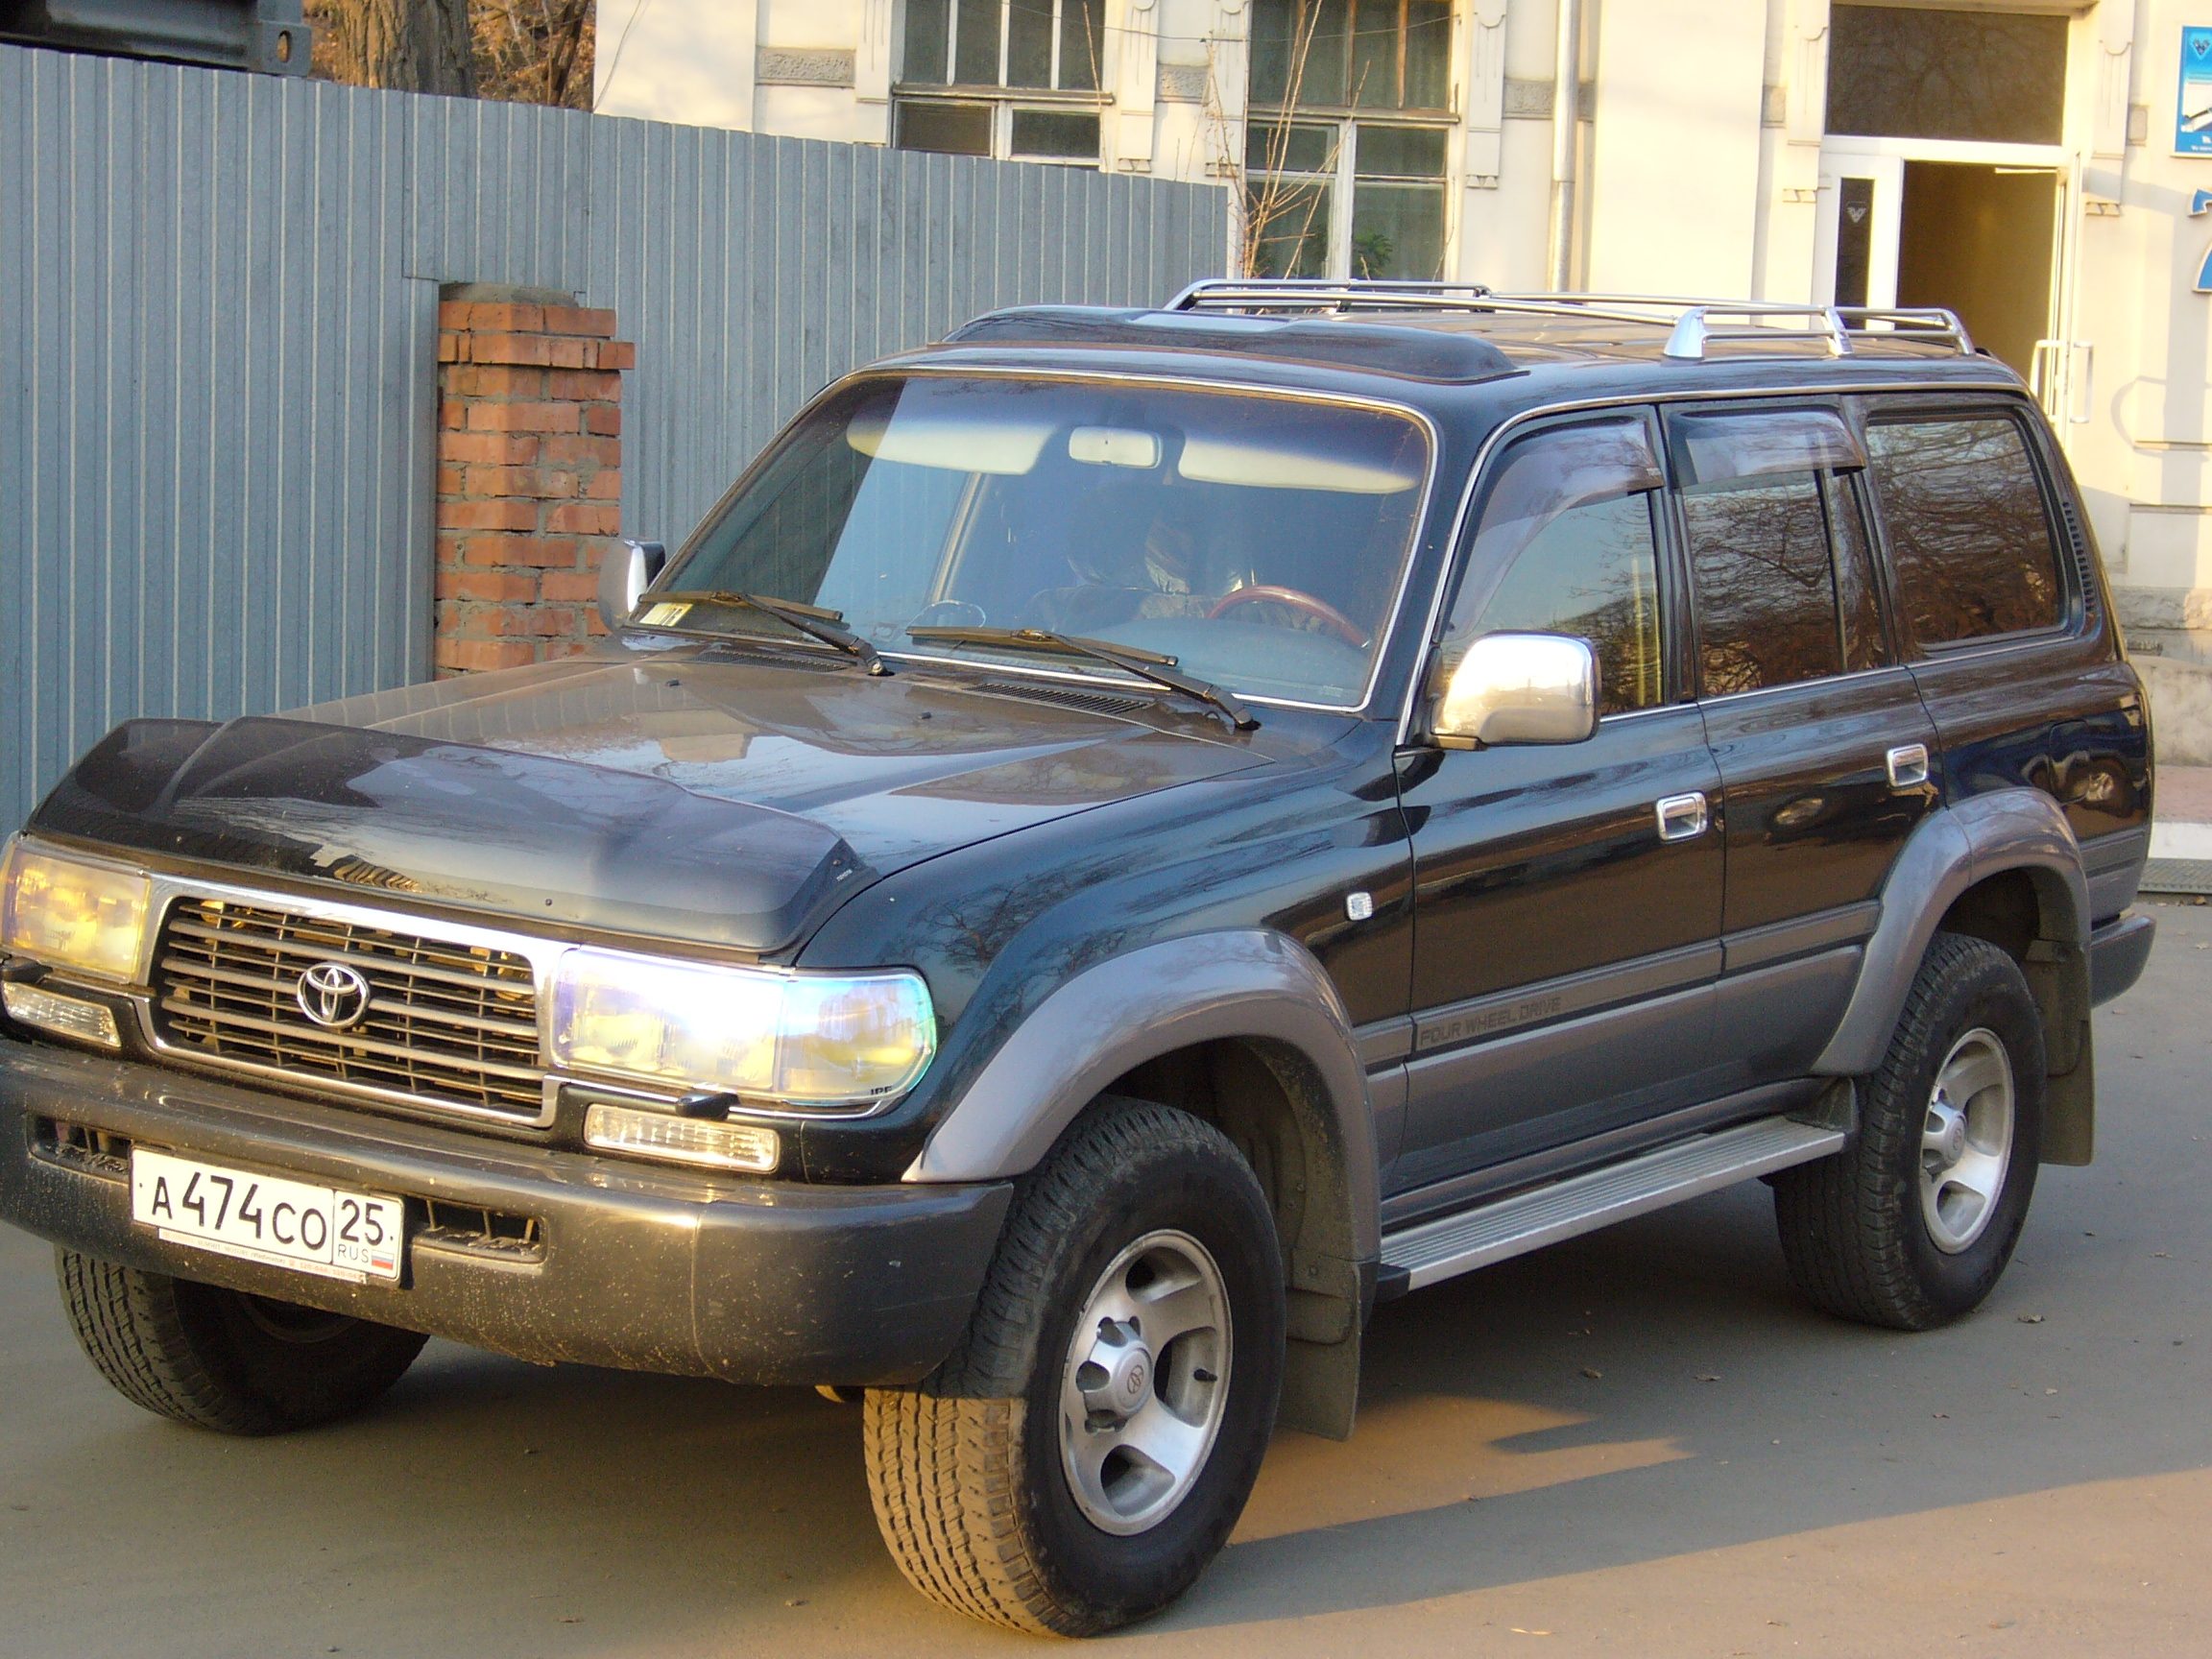 1996 Toyota Land Cruiser Pictures 4200cc Diesel Manual